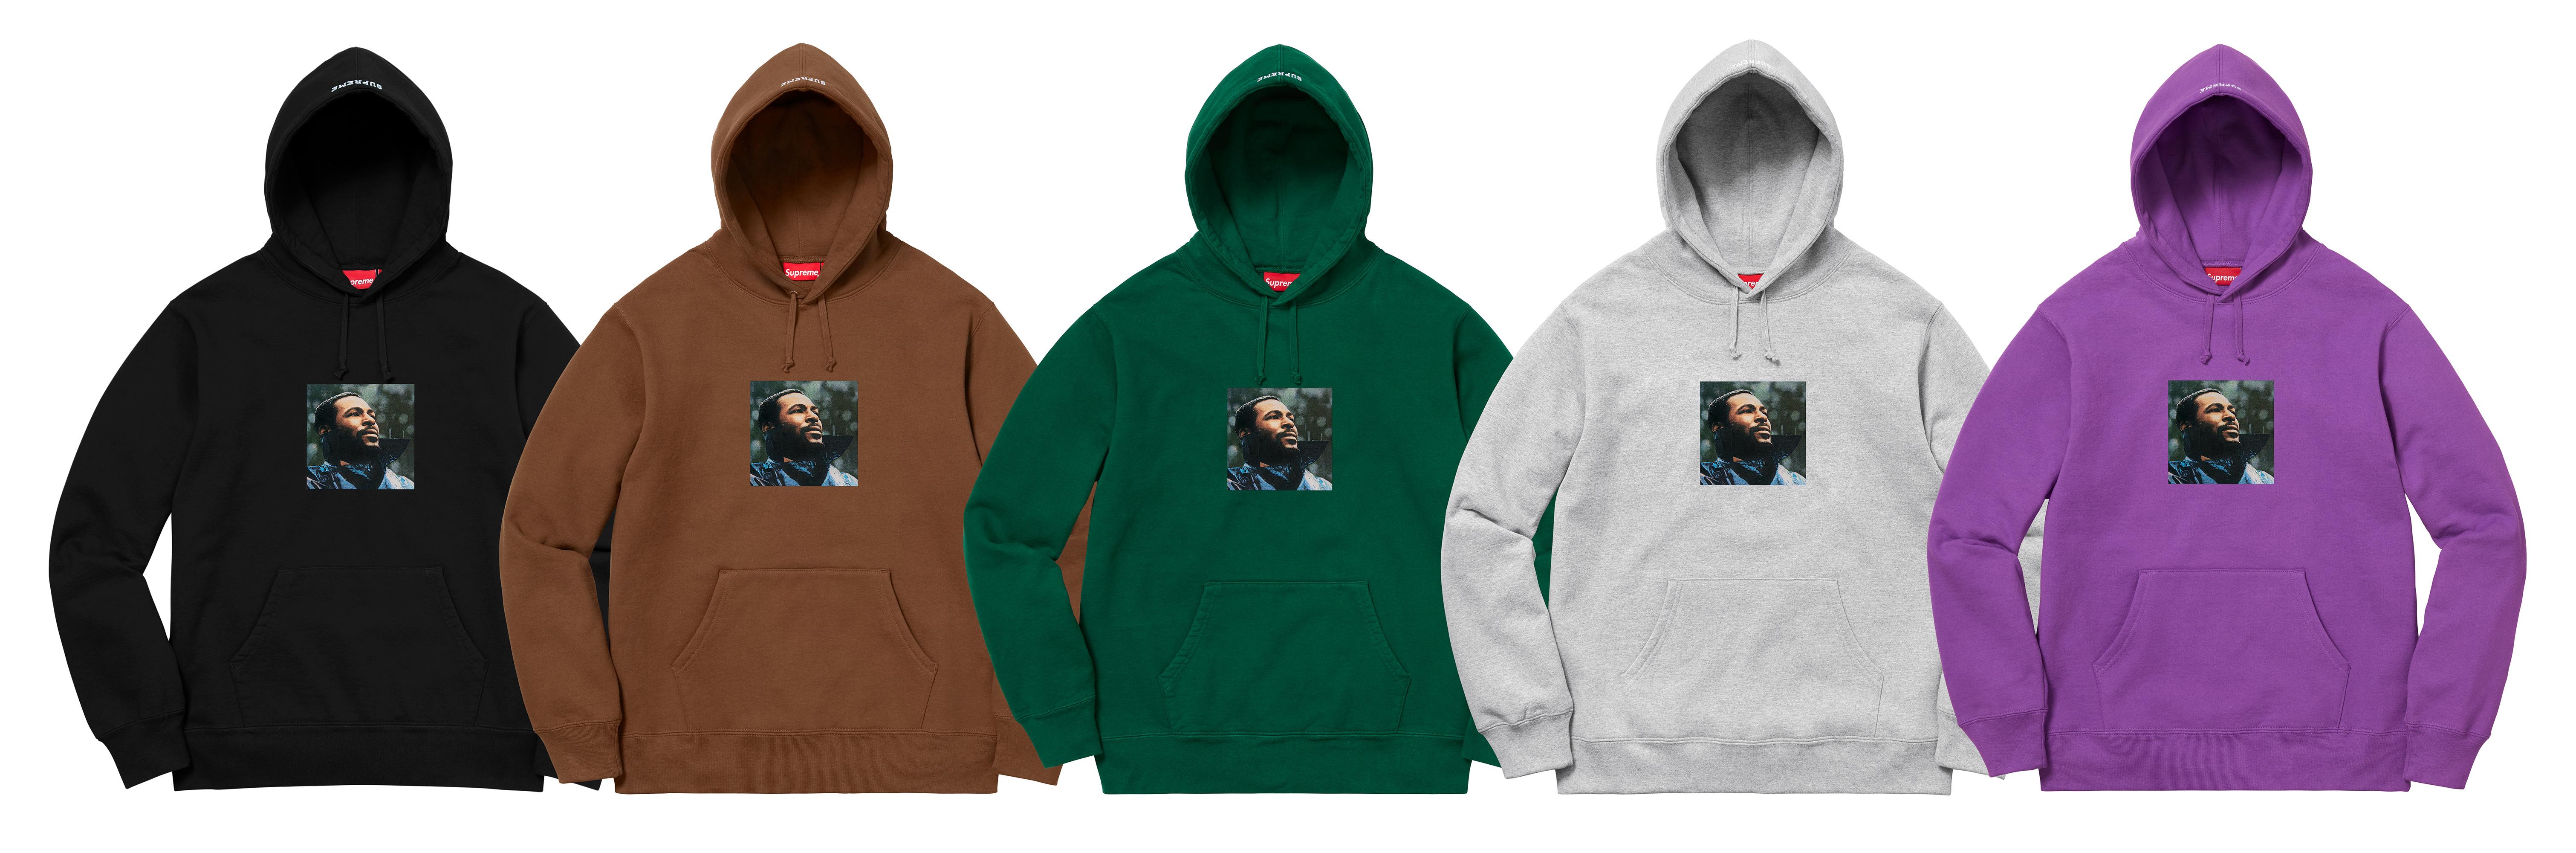 a5a17cdc Details Supreme Marvin Gaye Hooded Sweatshirt - Supreme Community